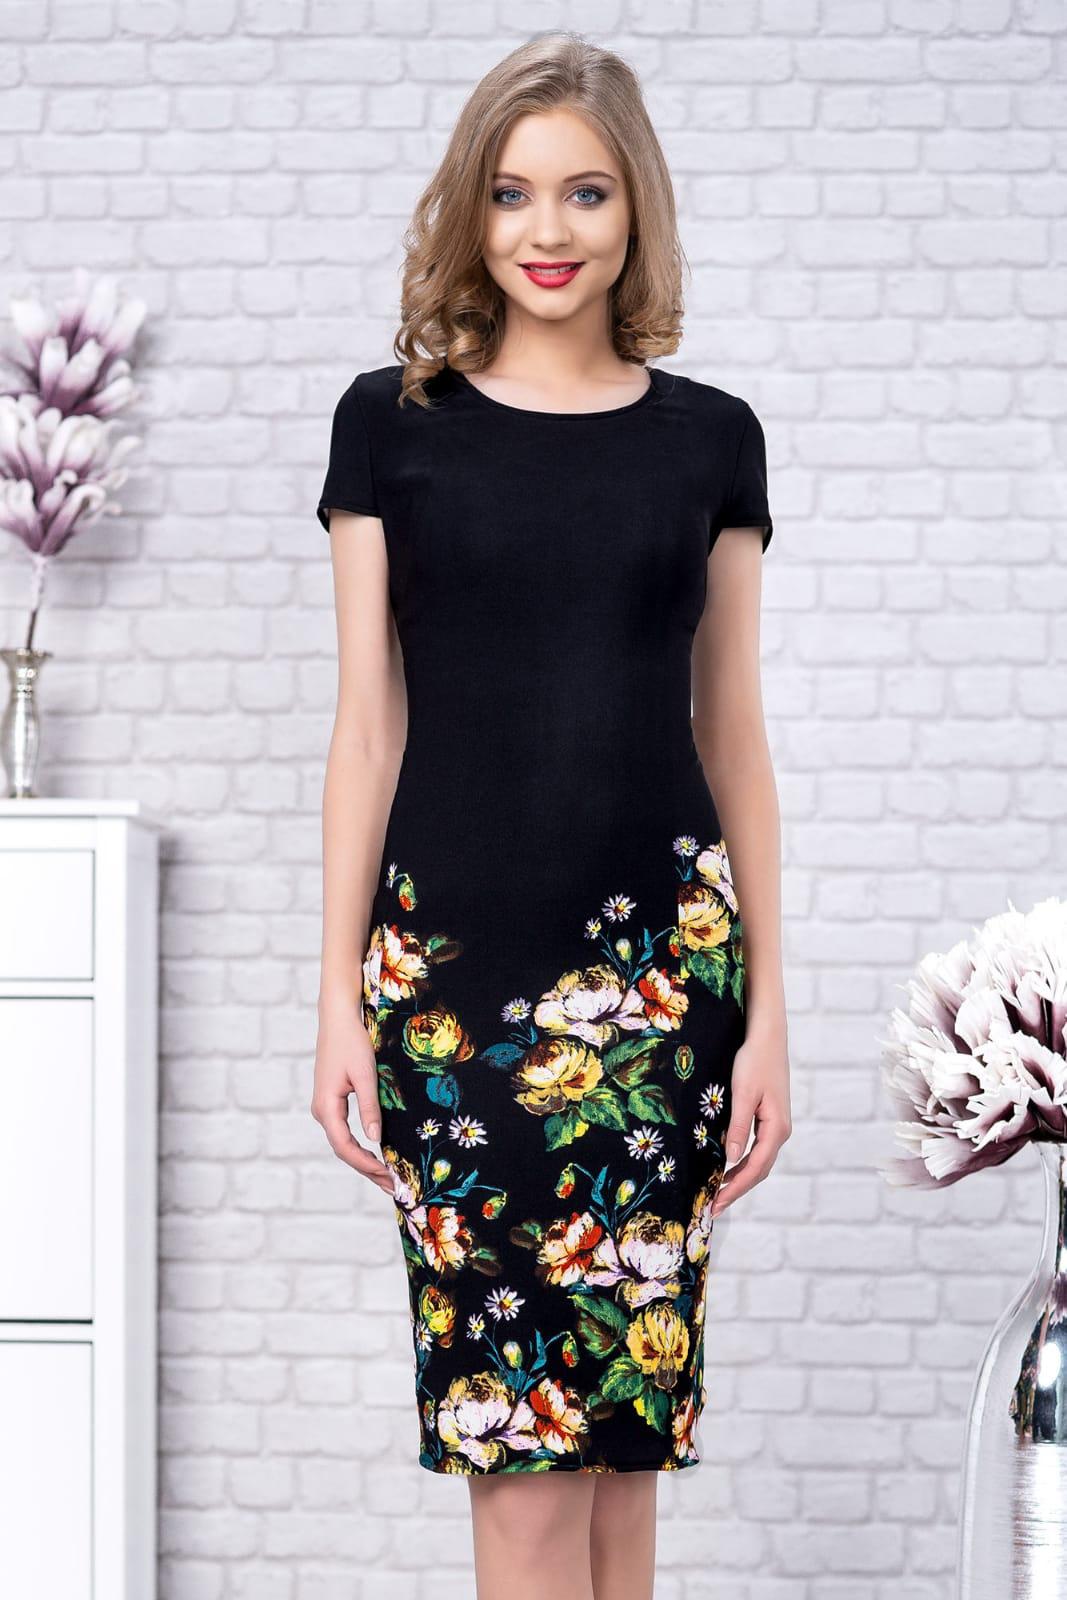 Rochie neagra eleganta midi tip creion din material reiat cu imprimeu floral si maneca scurta